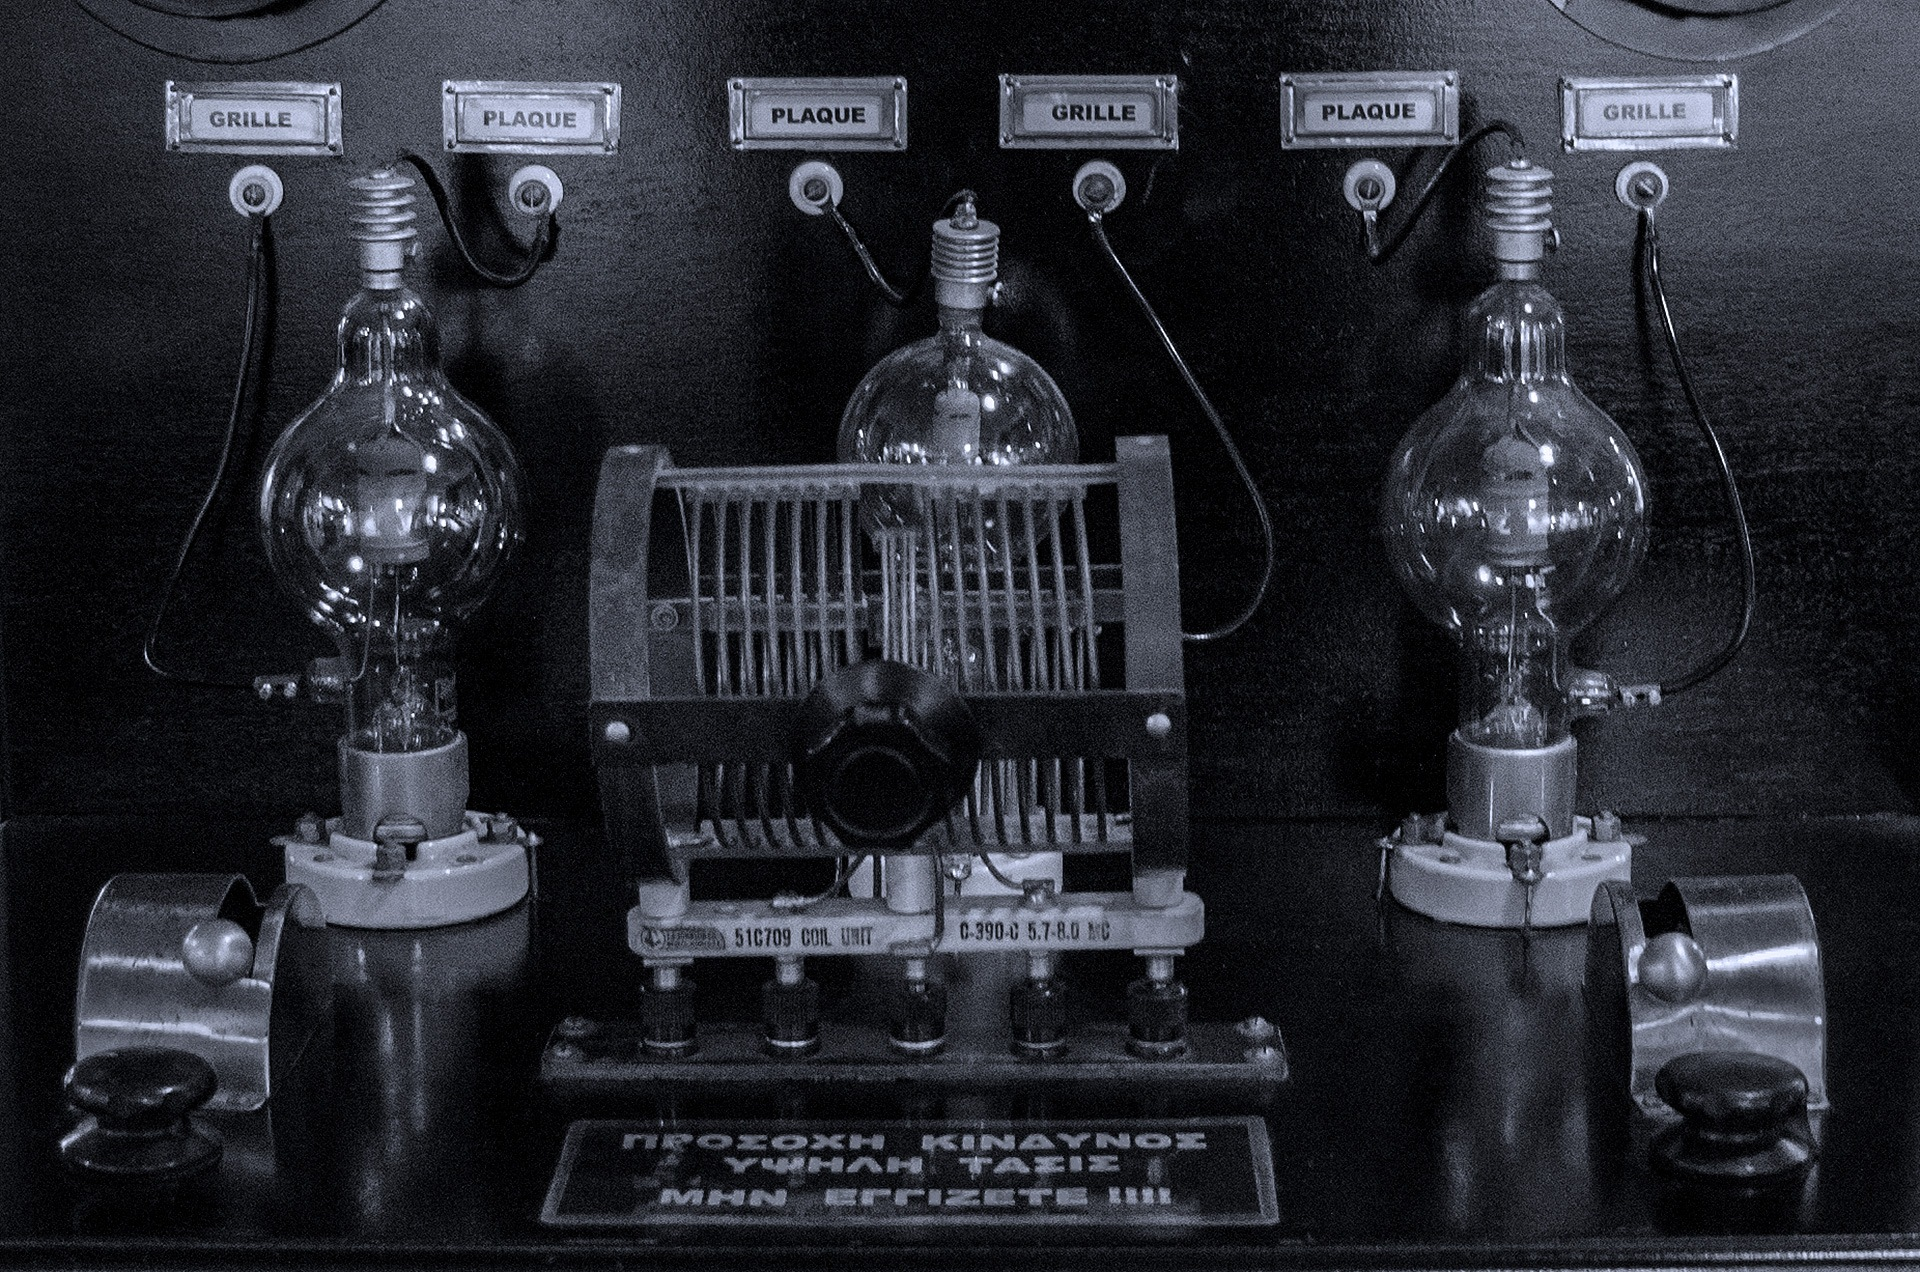 19th century battleship radio transmitter/receiver by Alexandros C